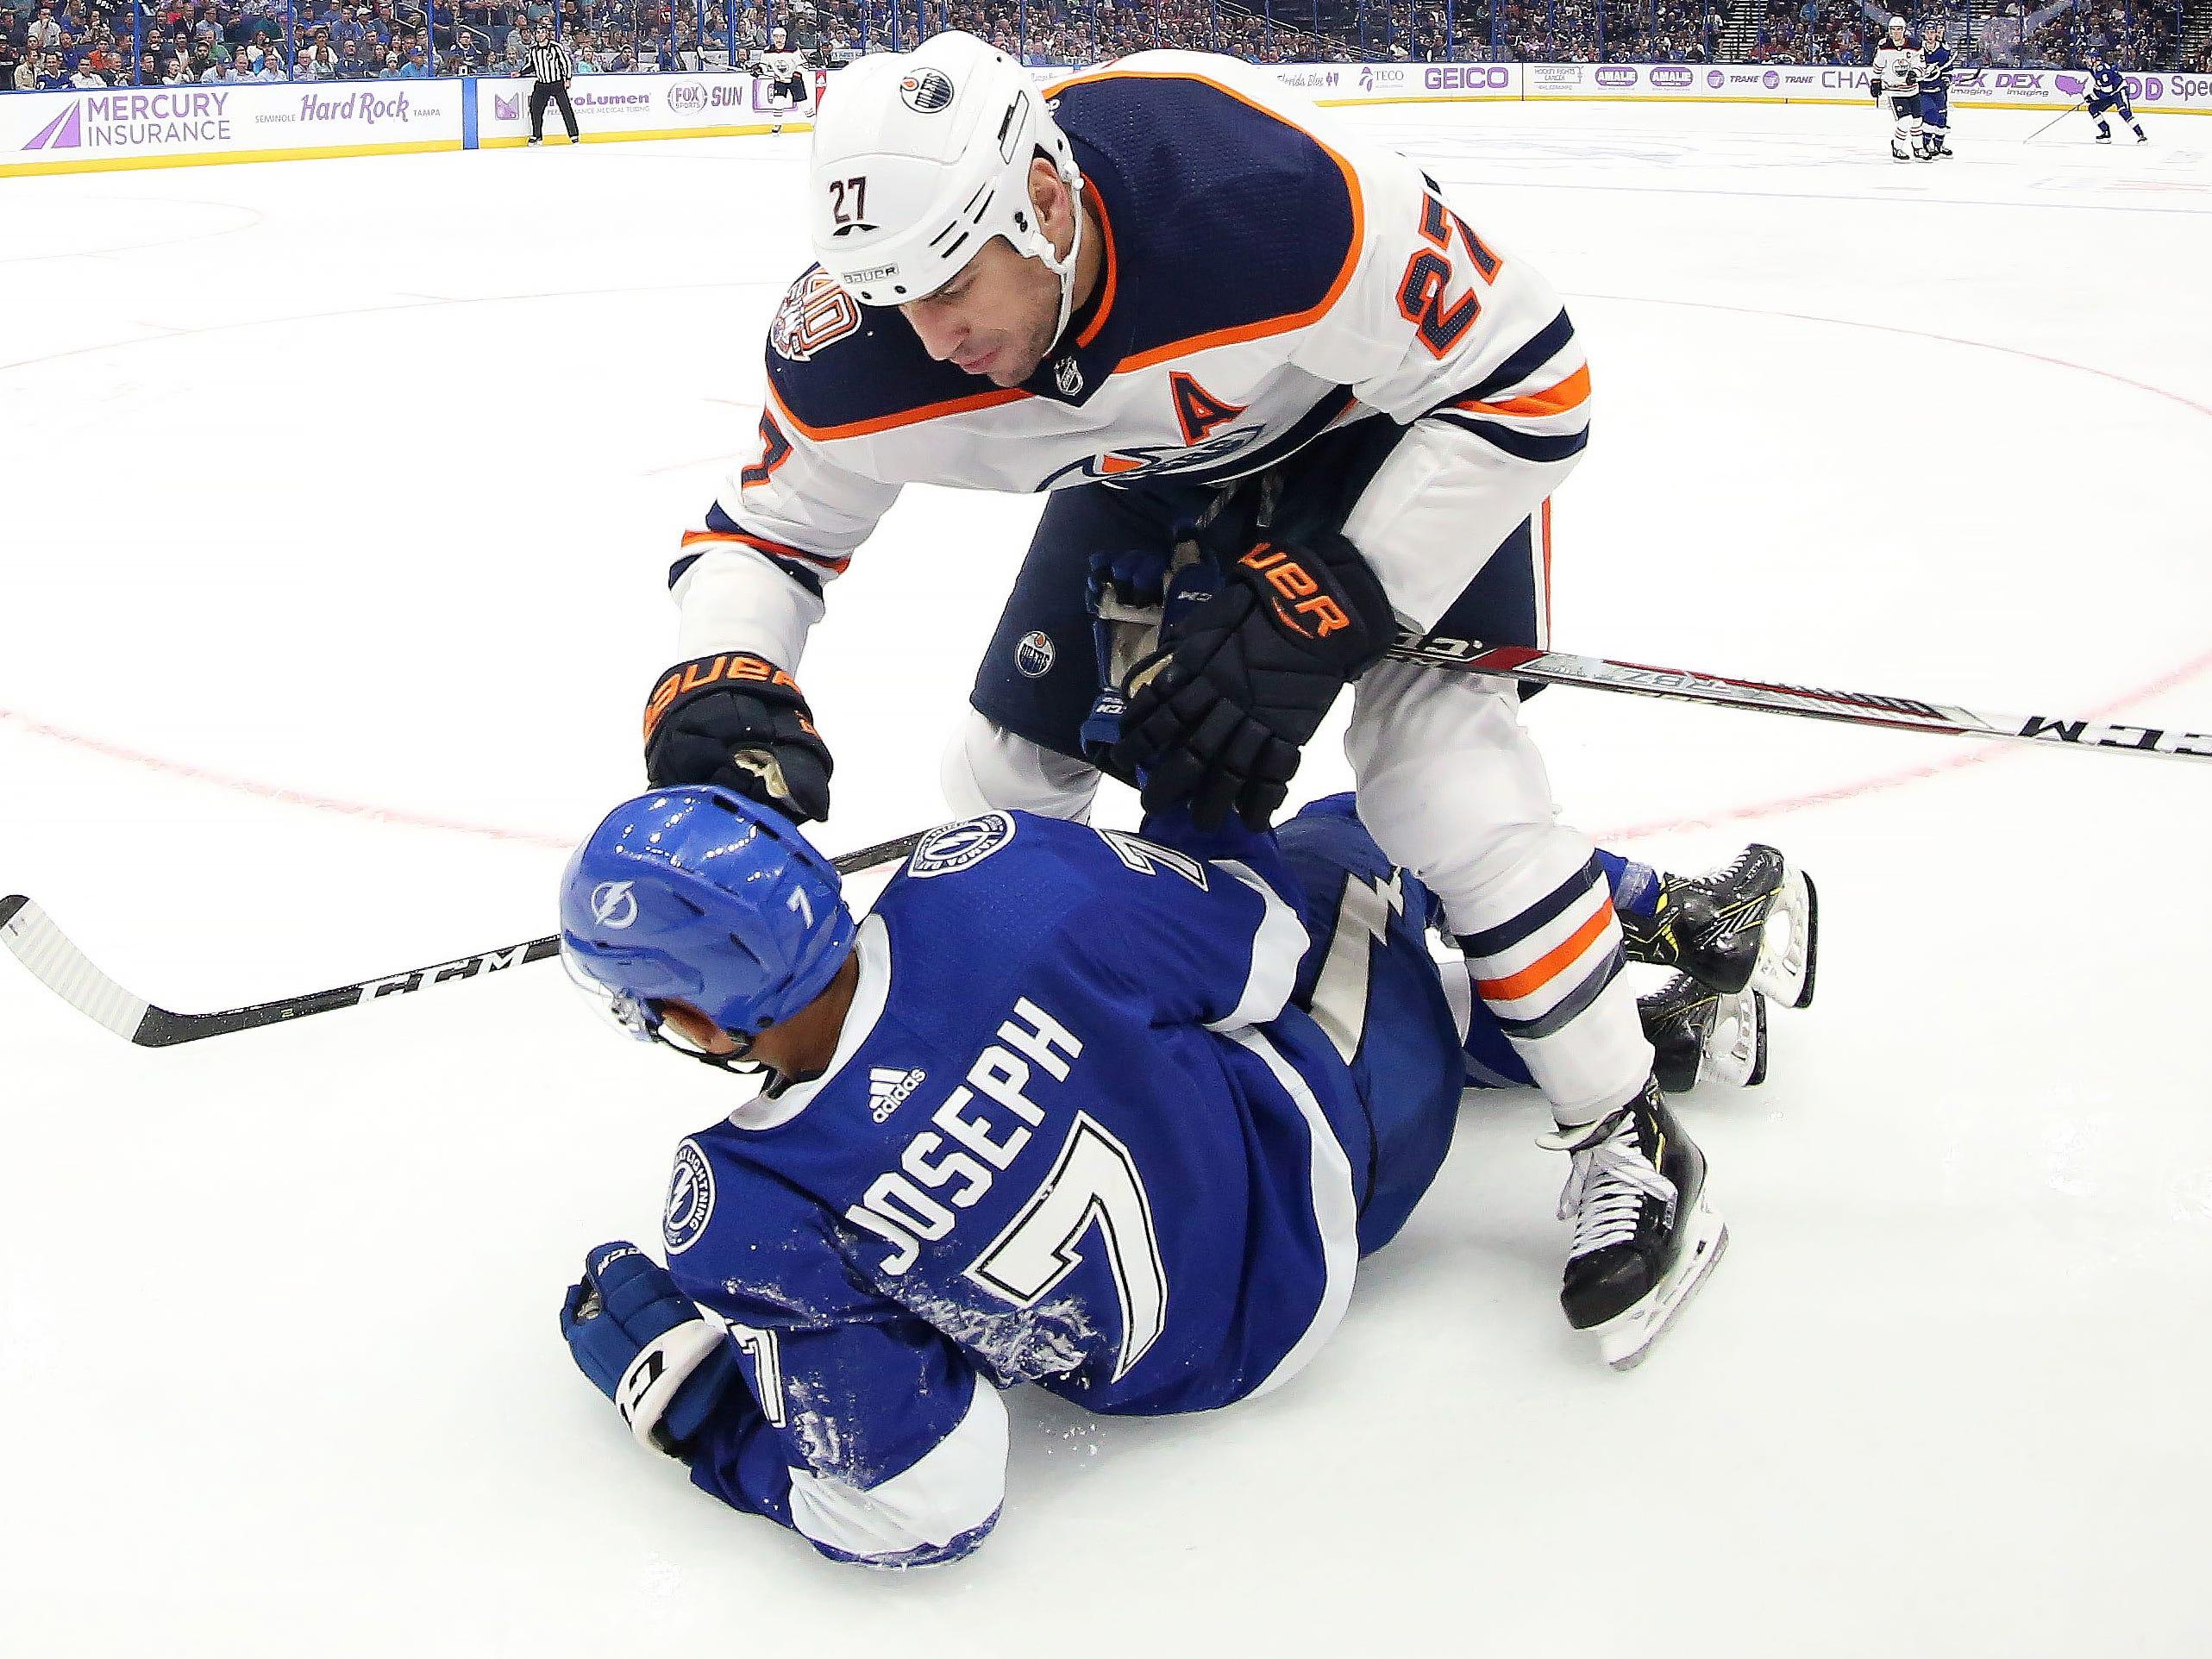 Nov. 6: Oilers' Milan Lucic vs. Lightning's Mathieu Joseph